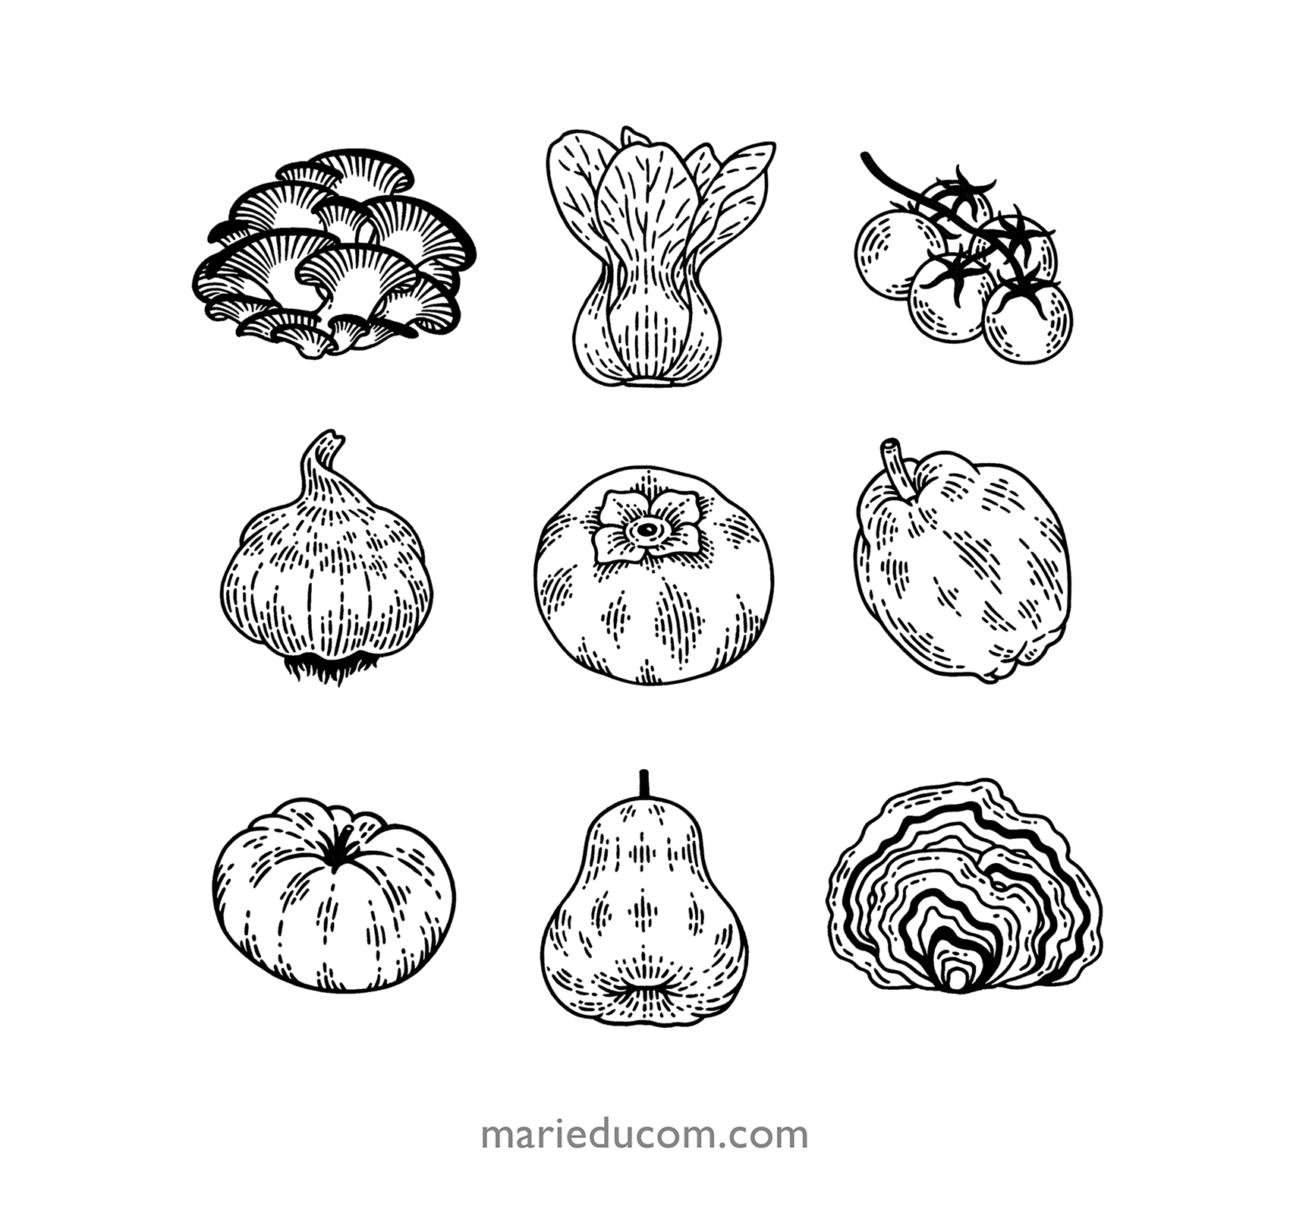 Fruits-vegetables-3-Marie-Ducom-2021